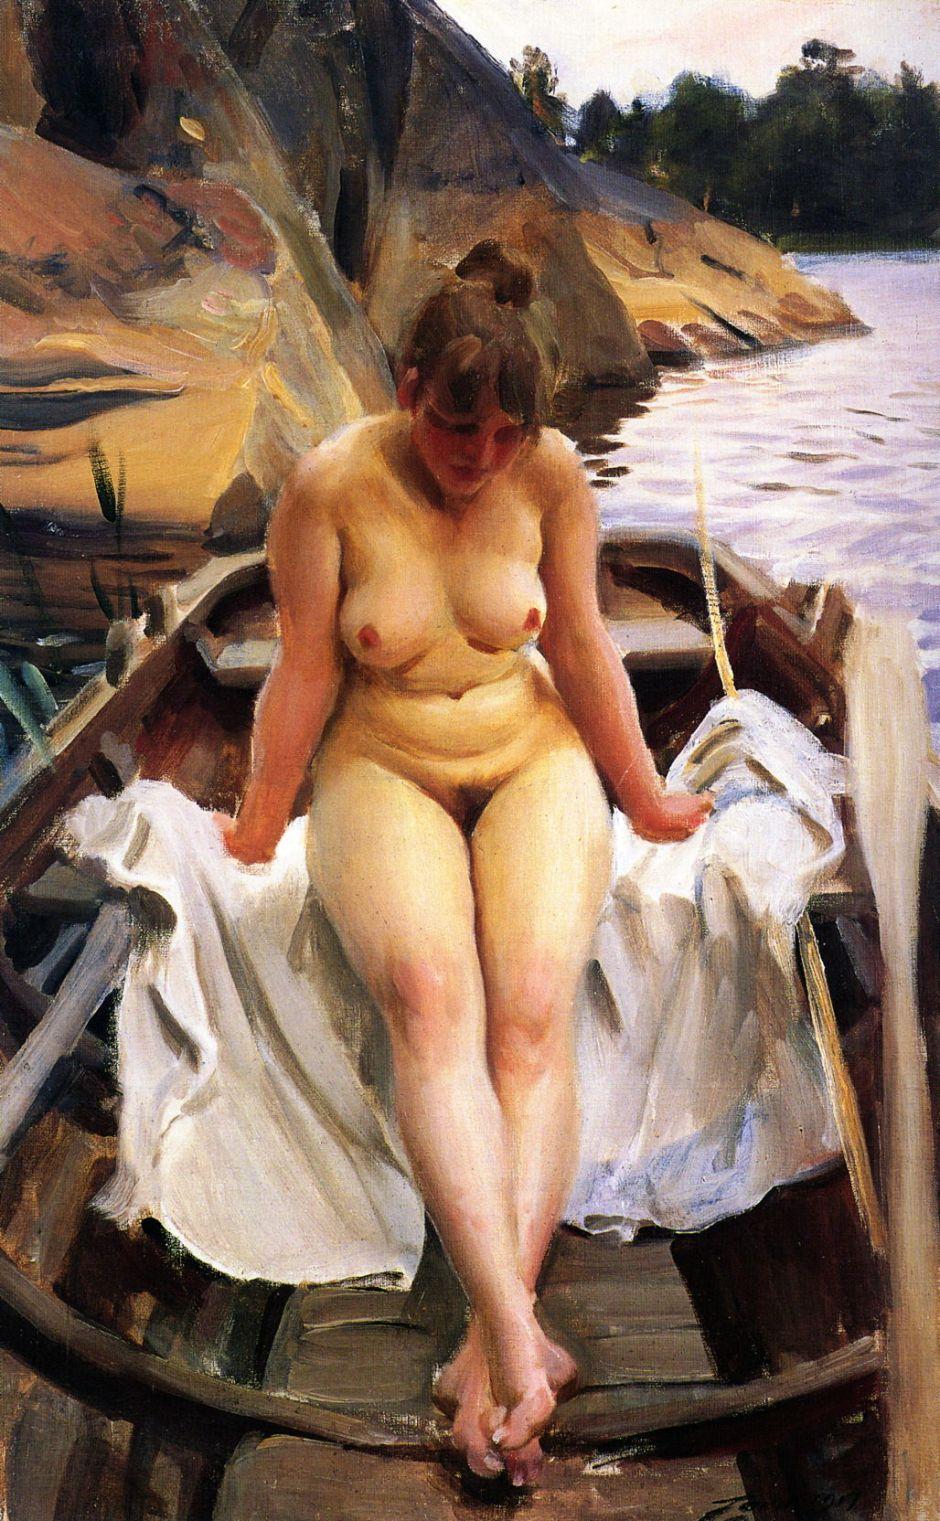 zorninwernersboat